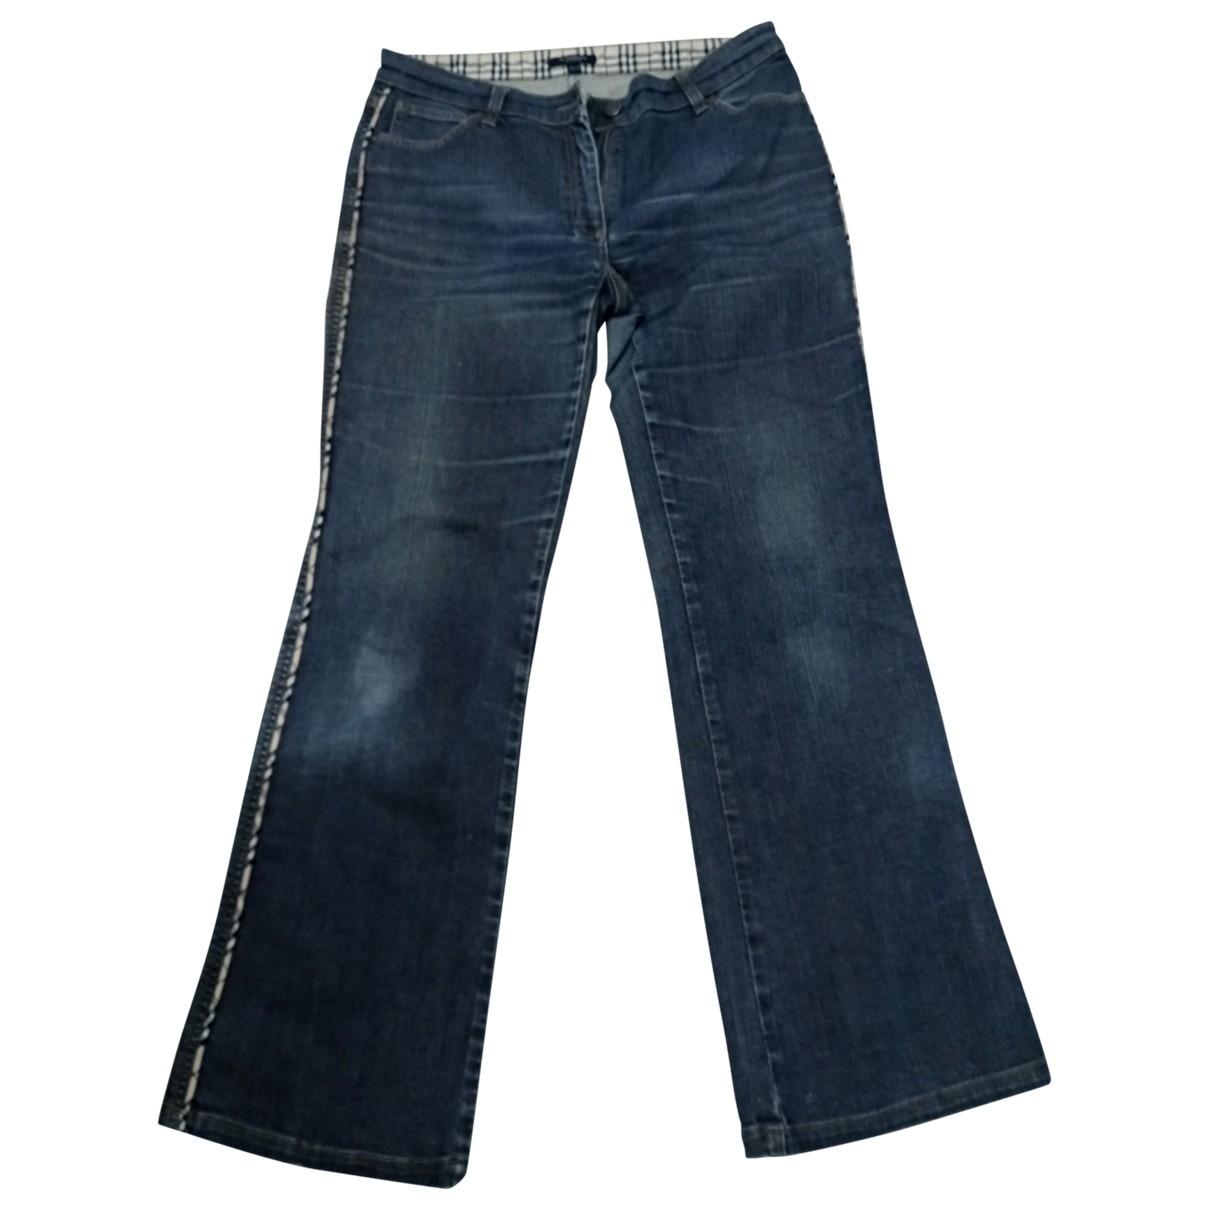 Burberry \N Blue Denim - Jeans Trousers for Women 40 FR